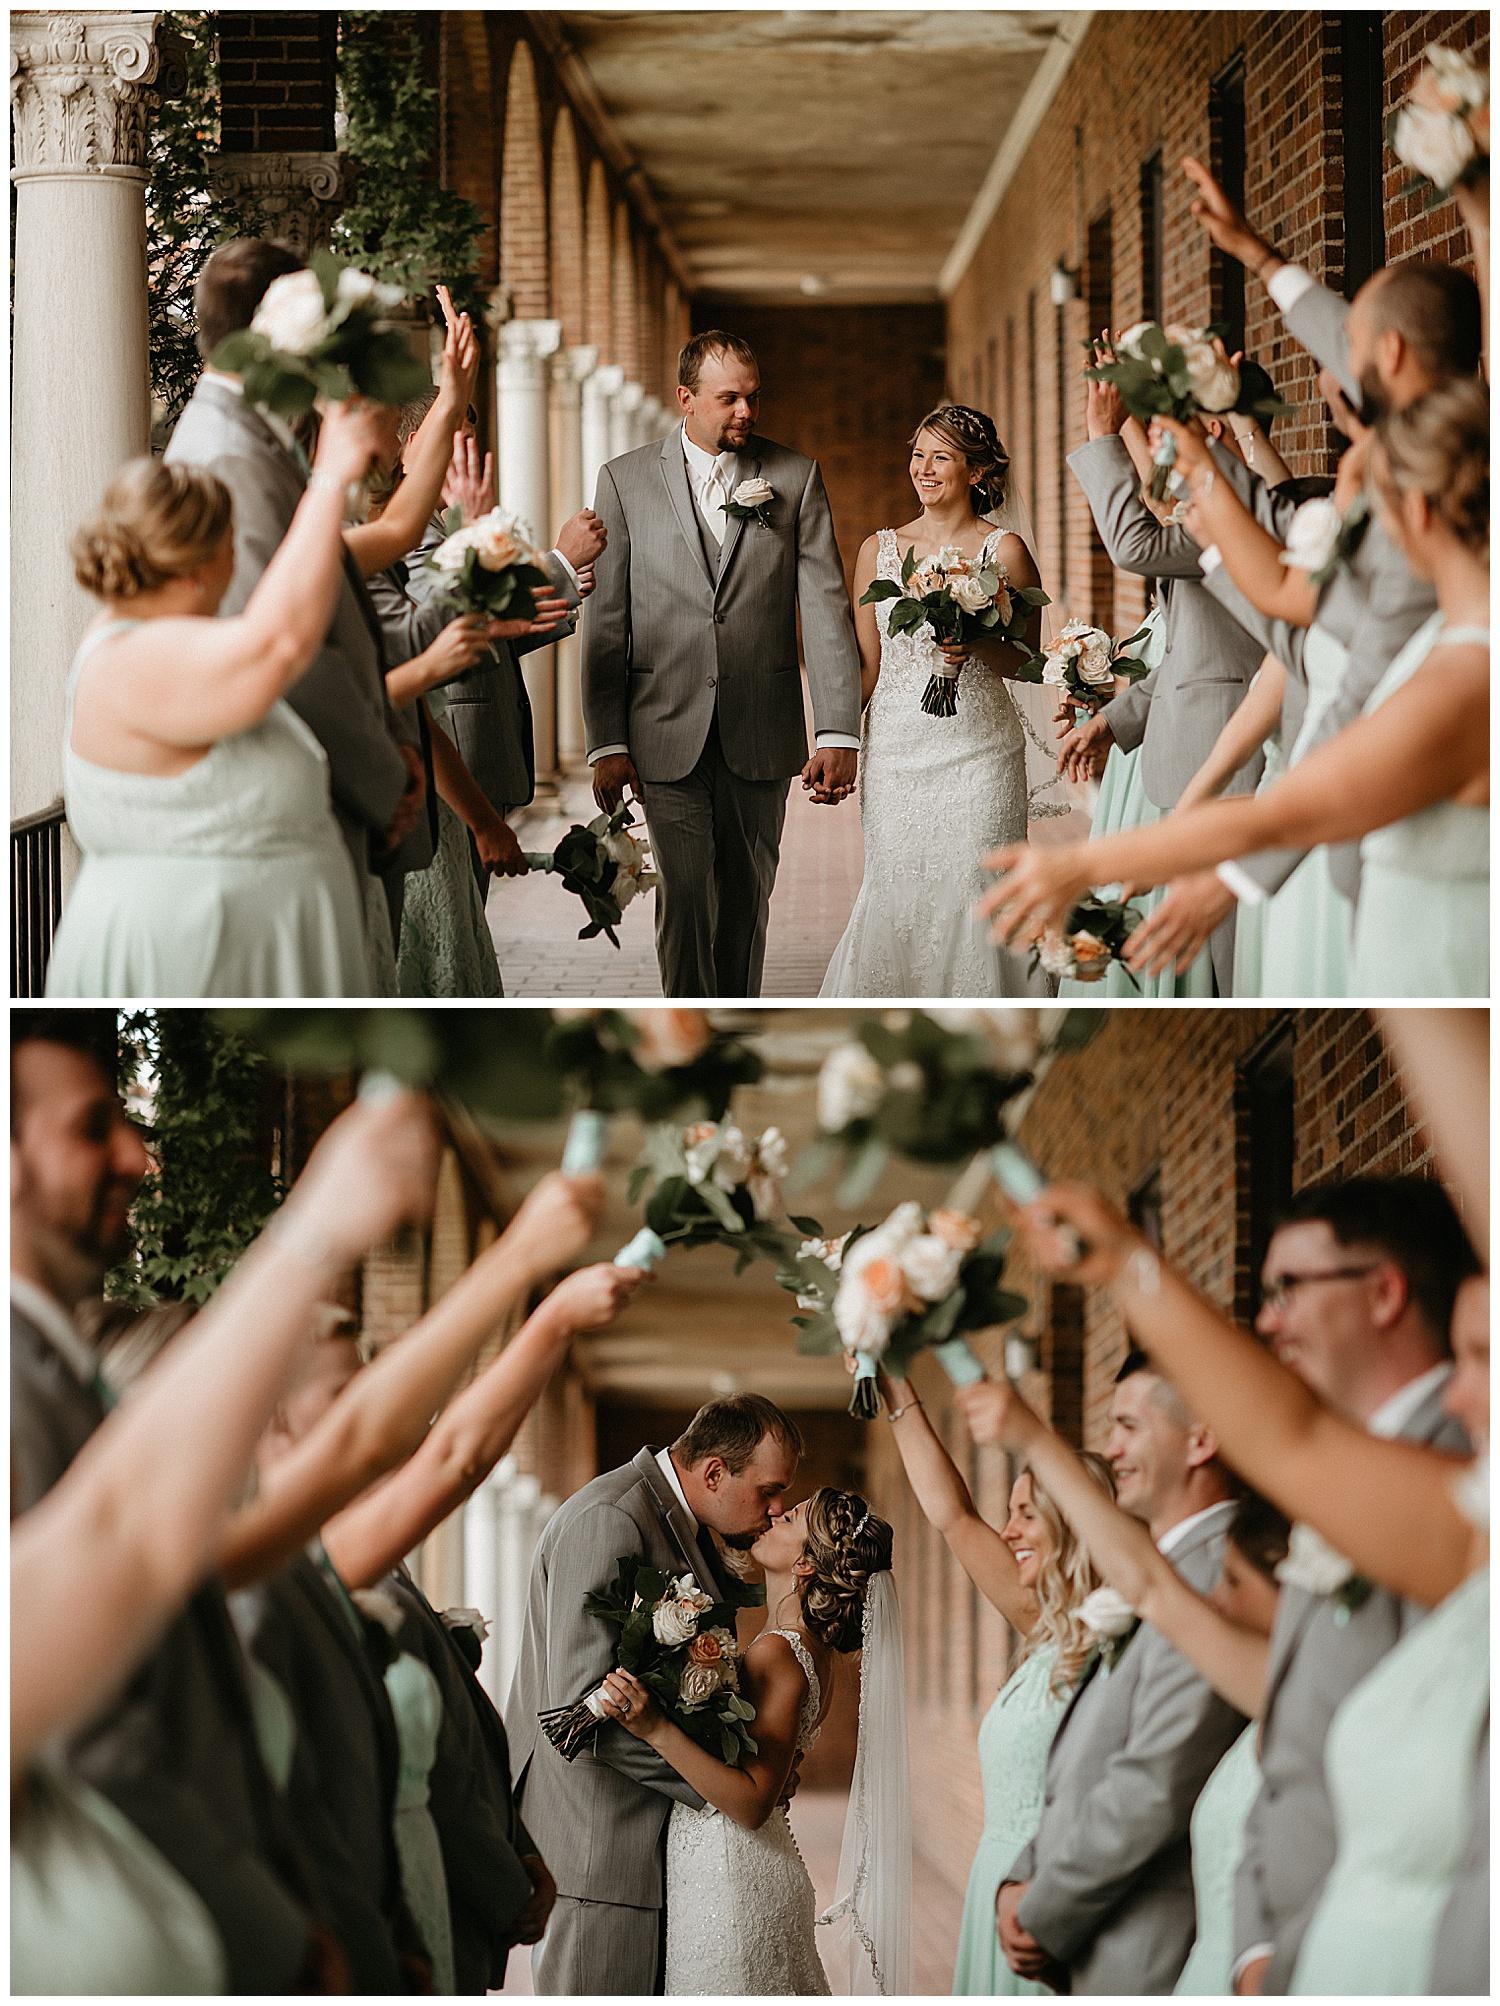 NEPA-Lehigh-Valley-Wedding-Photographer-at-Fountain-Springs-Country-Inn-Ashland-PA_0029.jpg